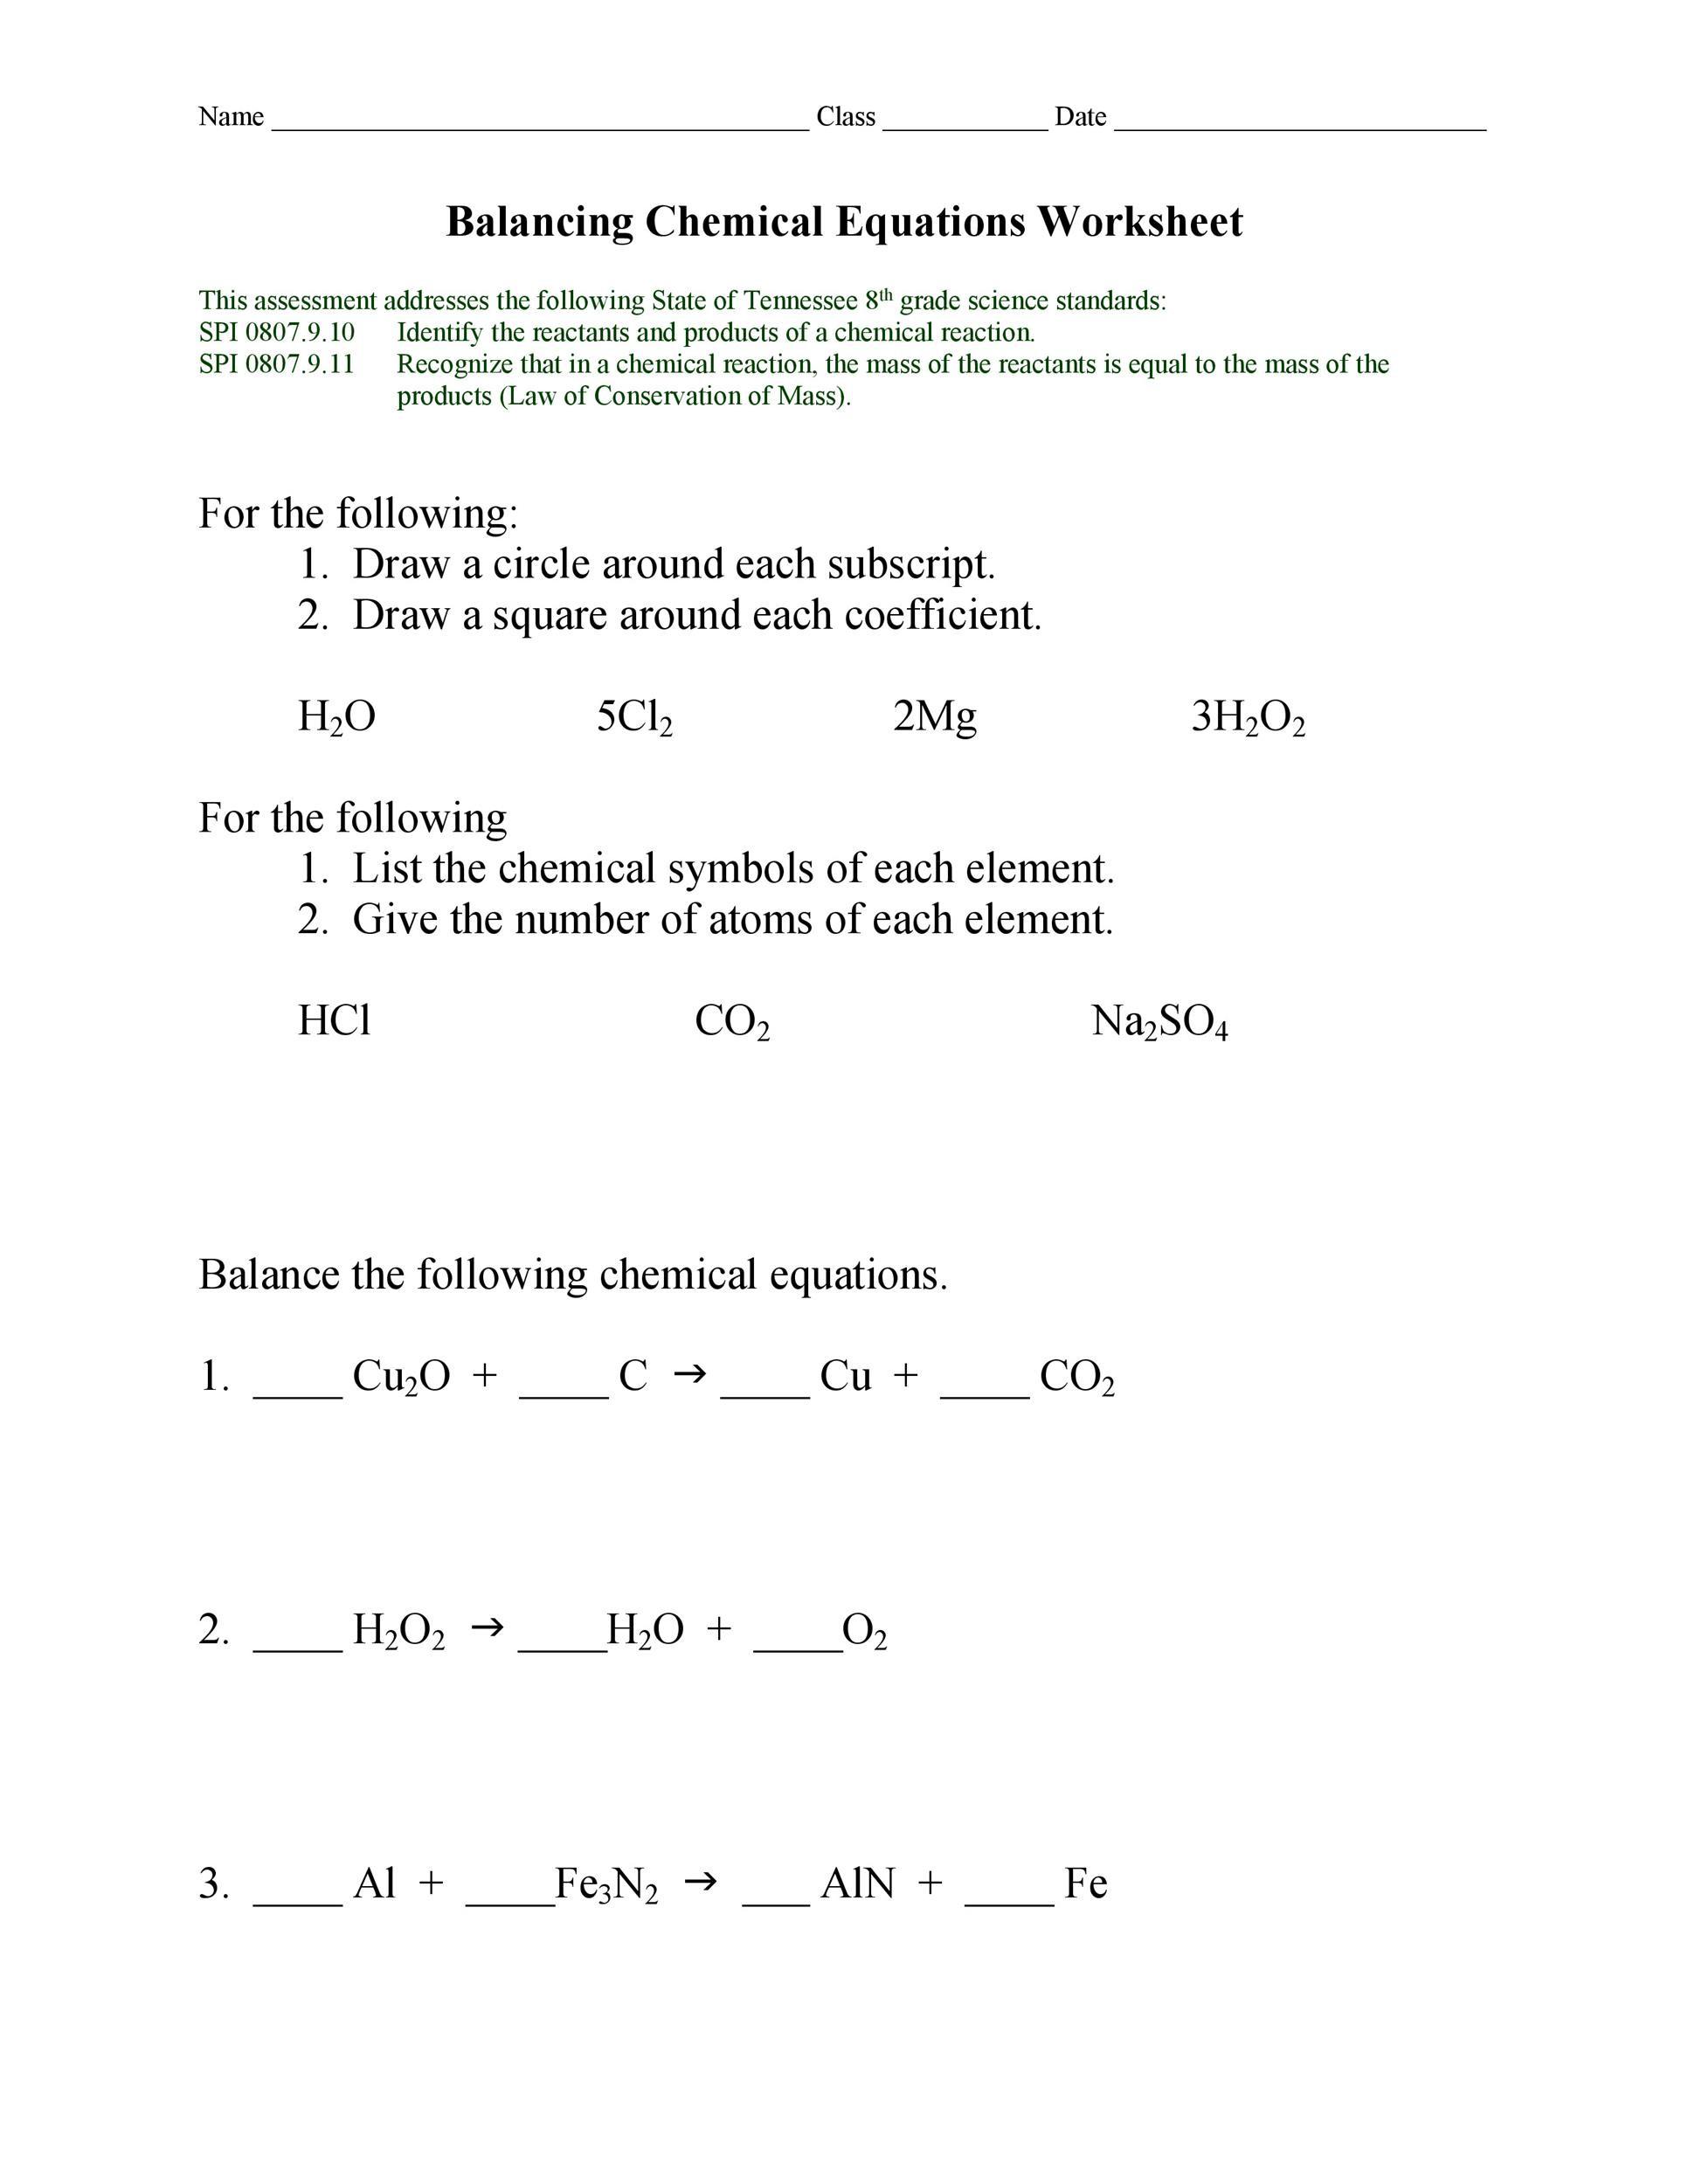 Balancing chemical equations worksheets pdf